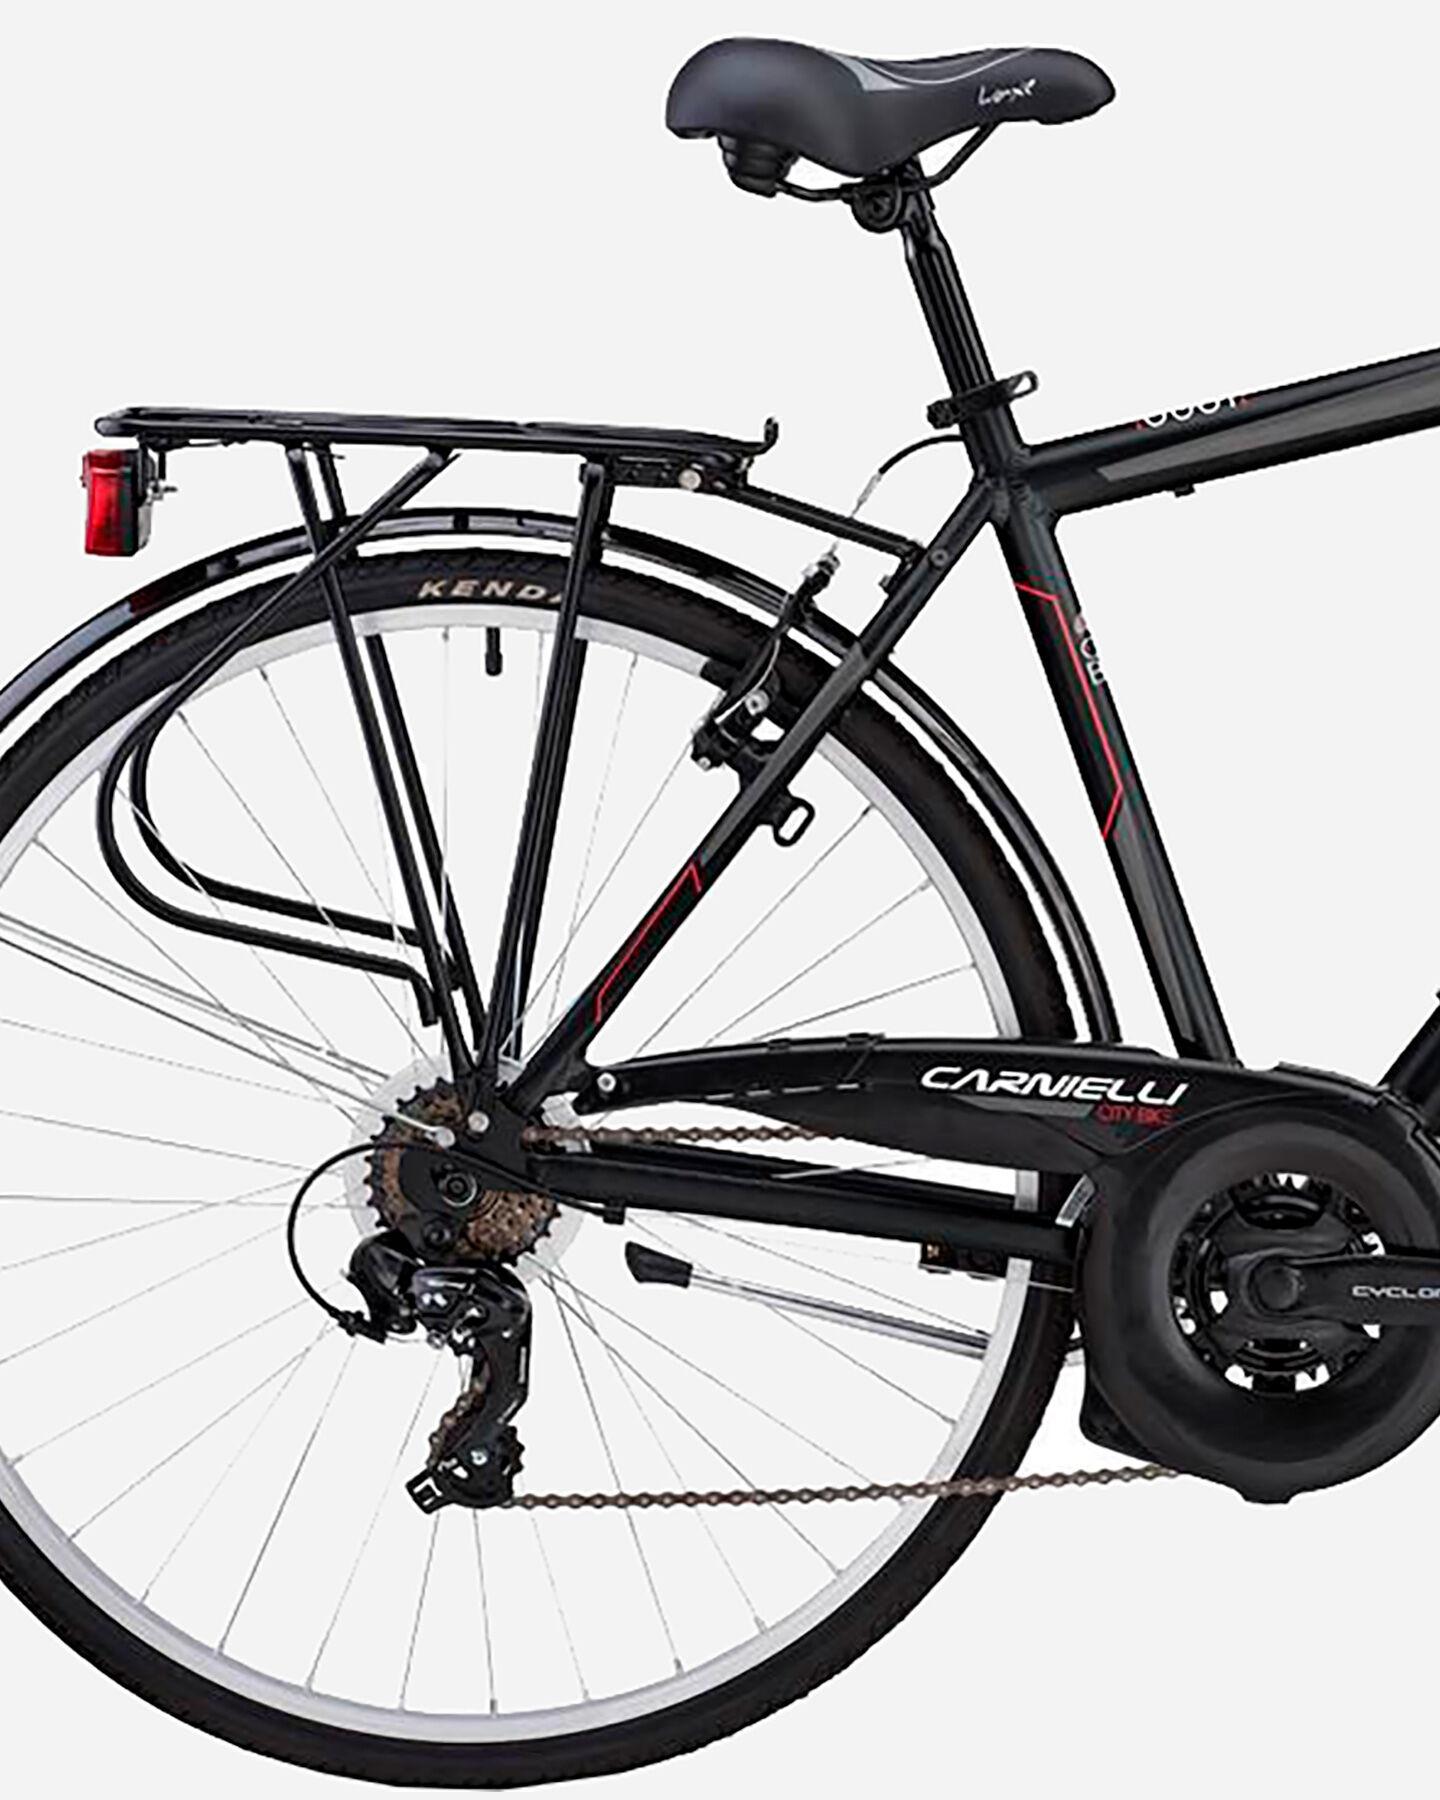 City bike CARNIELLI CITY BIKE RANDONNE M S4072311|1|50 scatto 1